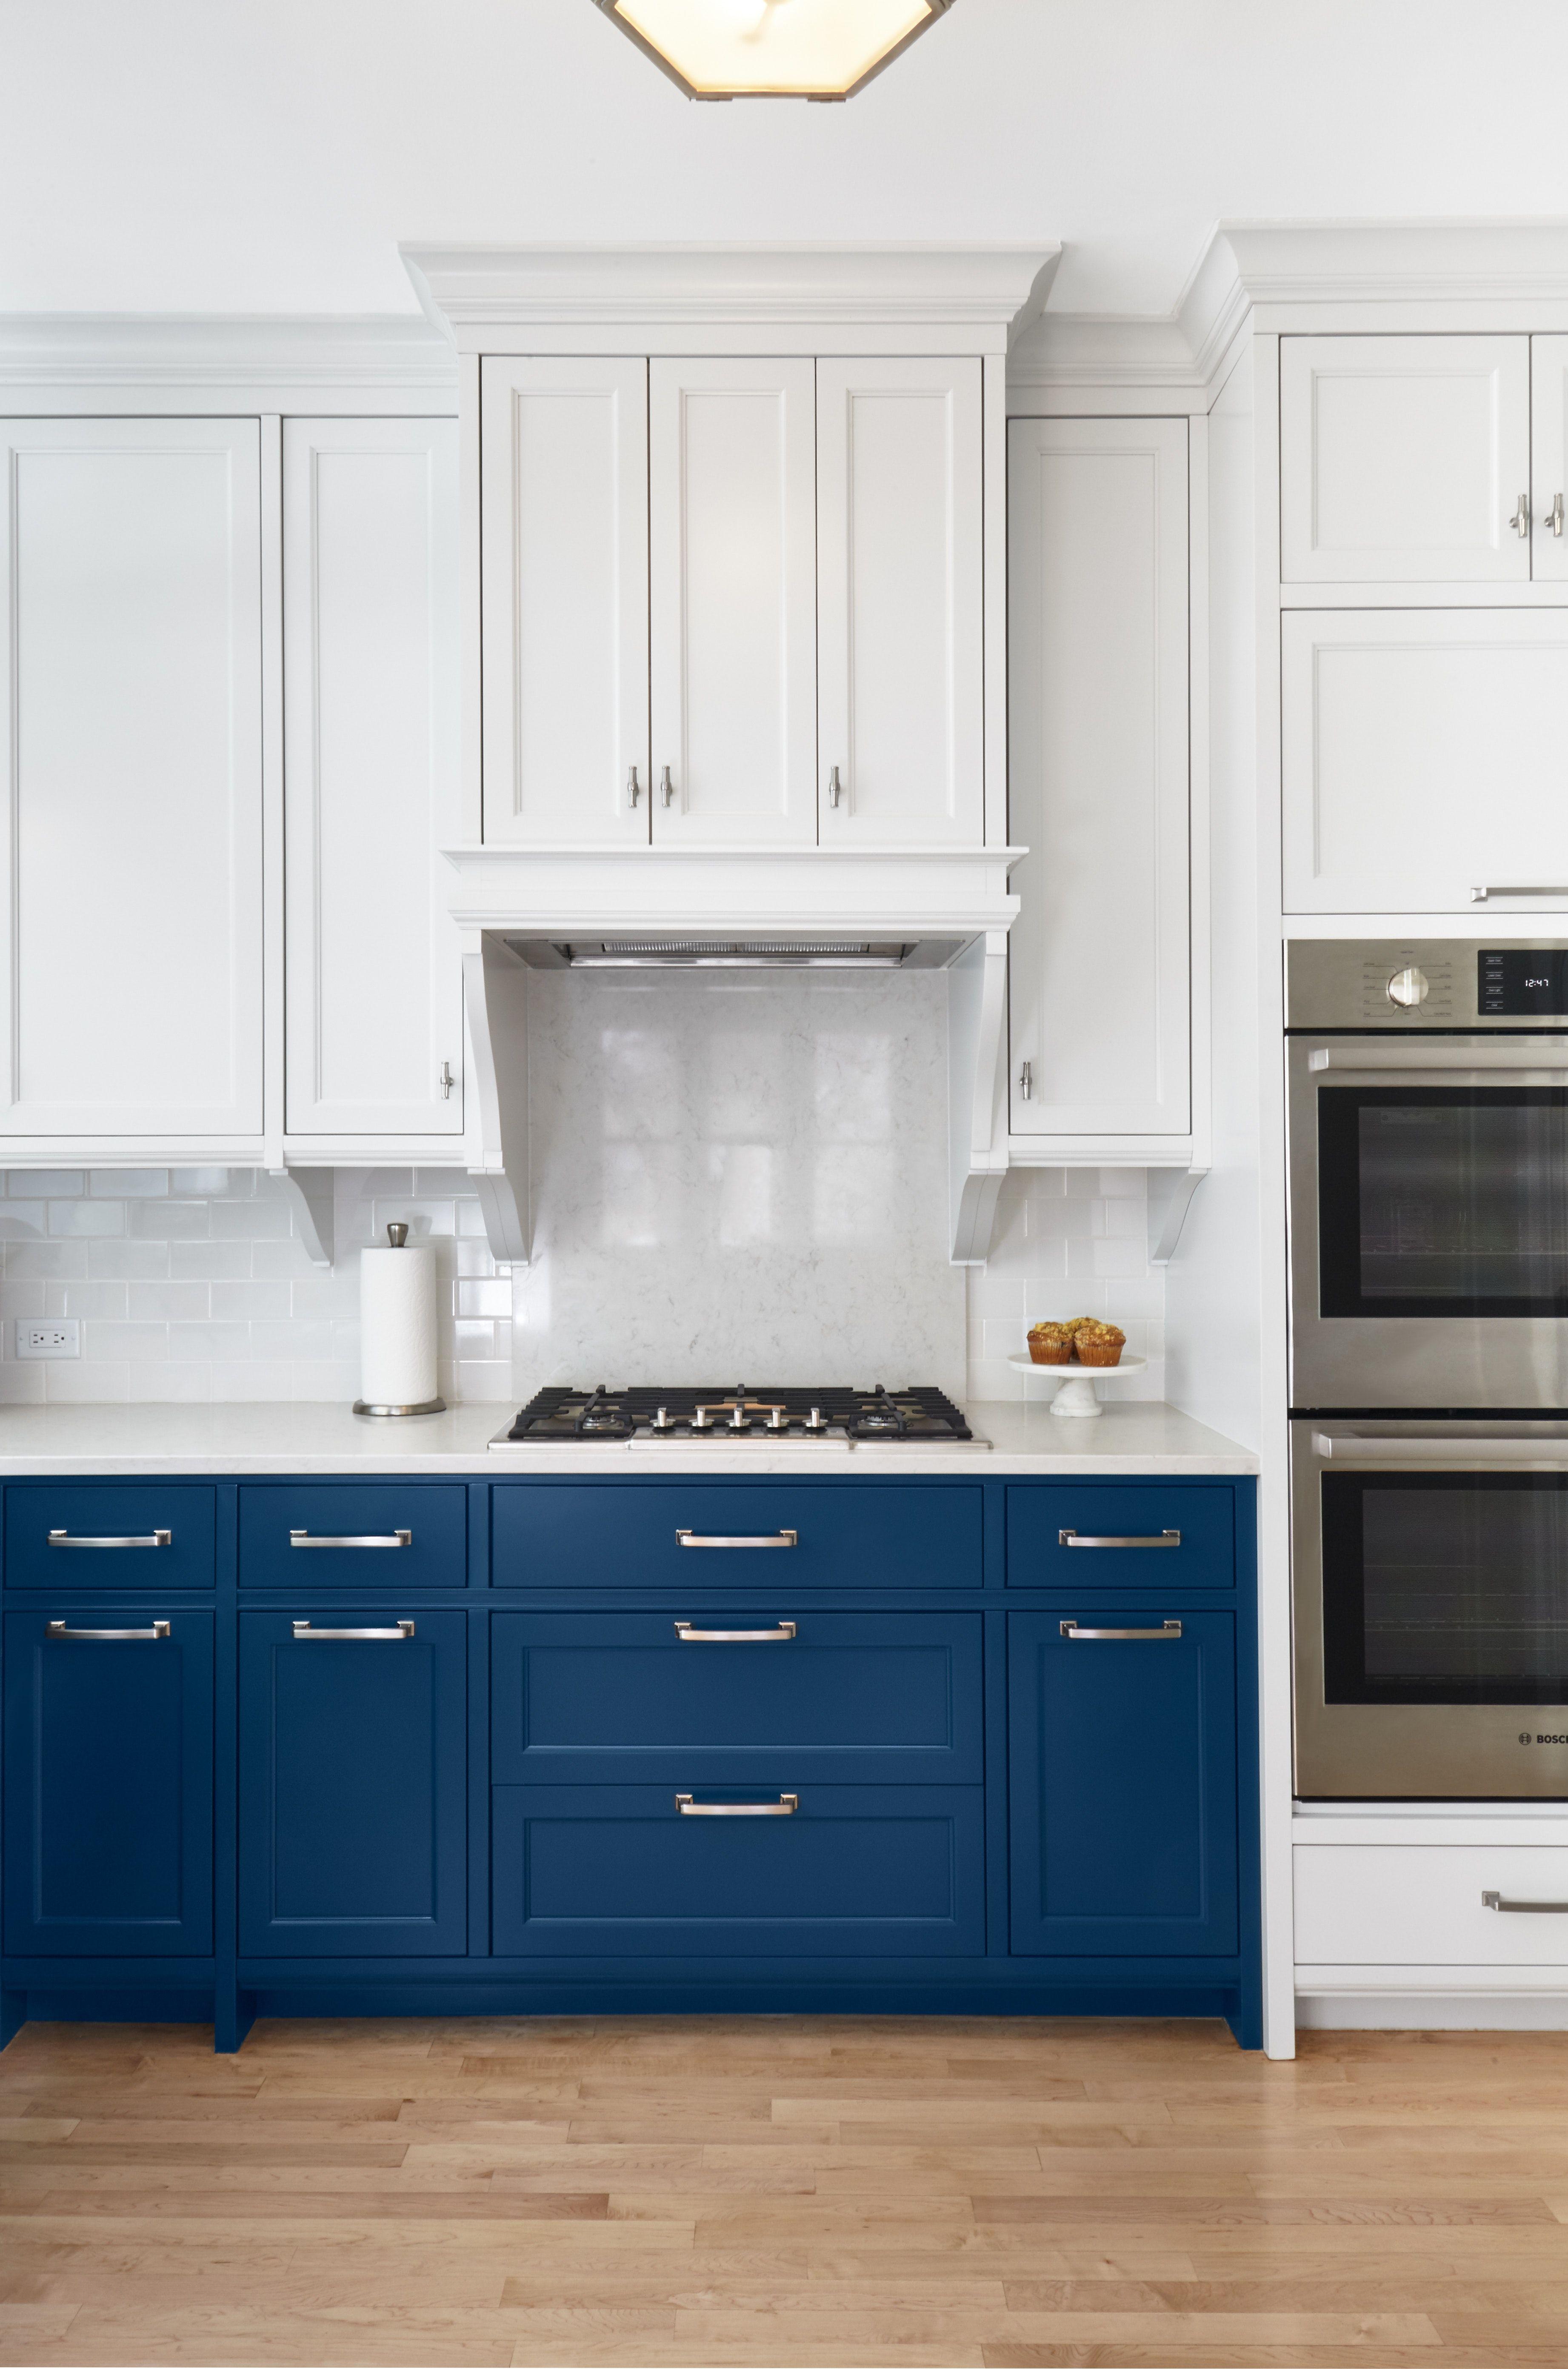 Classic Kitchen With Blue Lower And White Upper Cabinets Custom Hood Stylish Kitchen New Kitchen Cabinets Kitchen Renovation